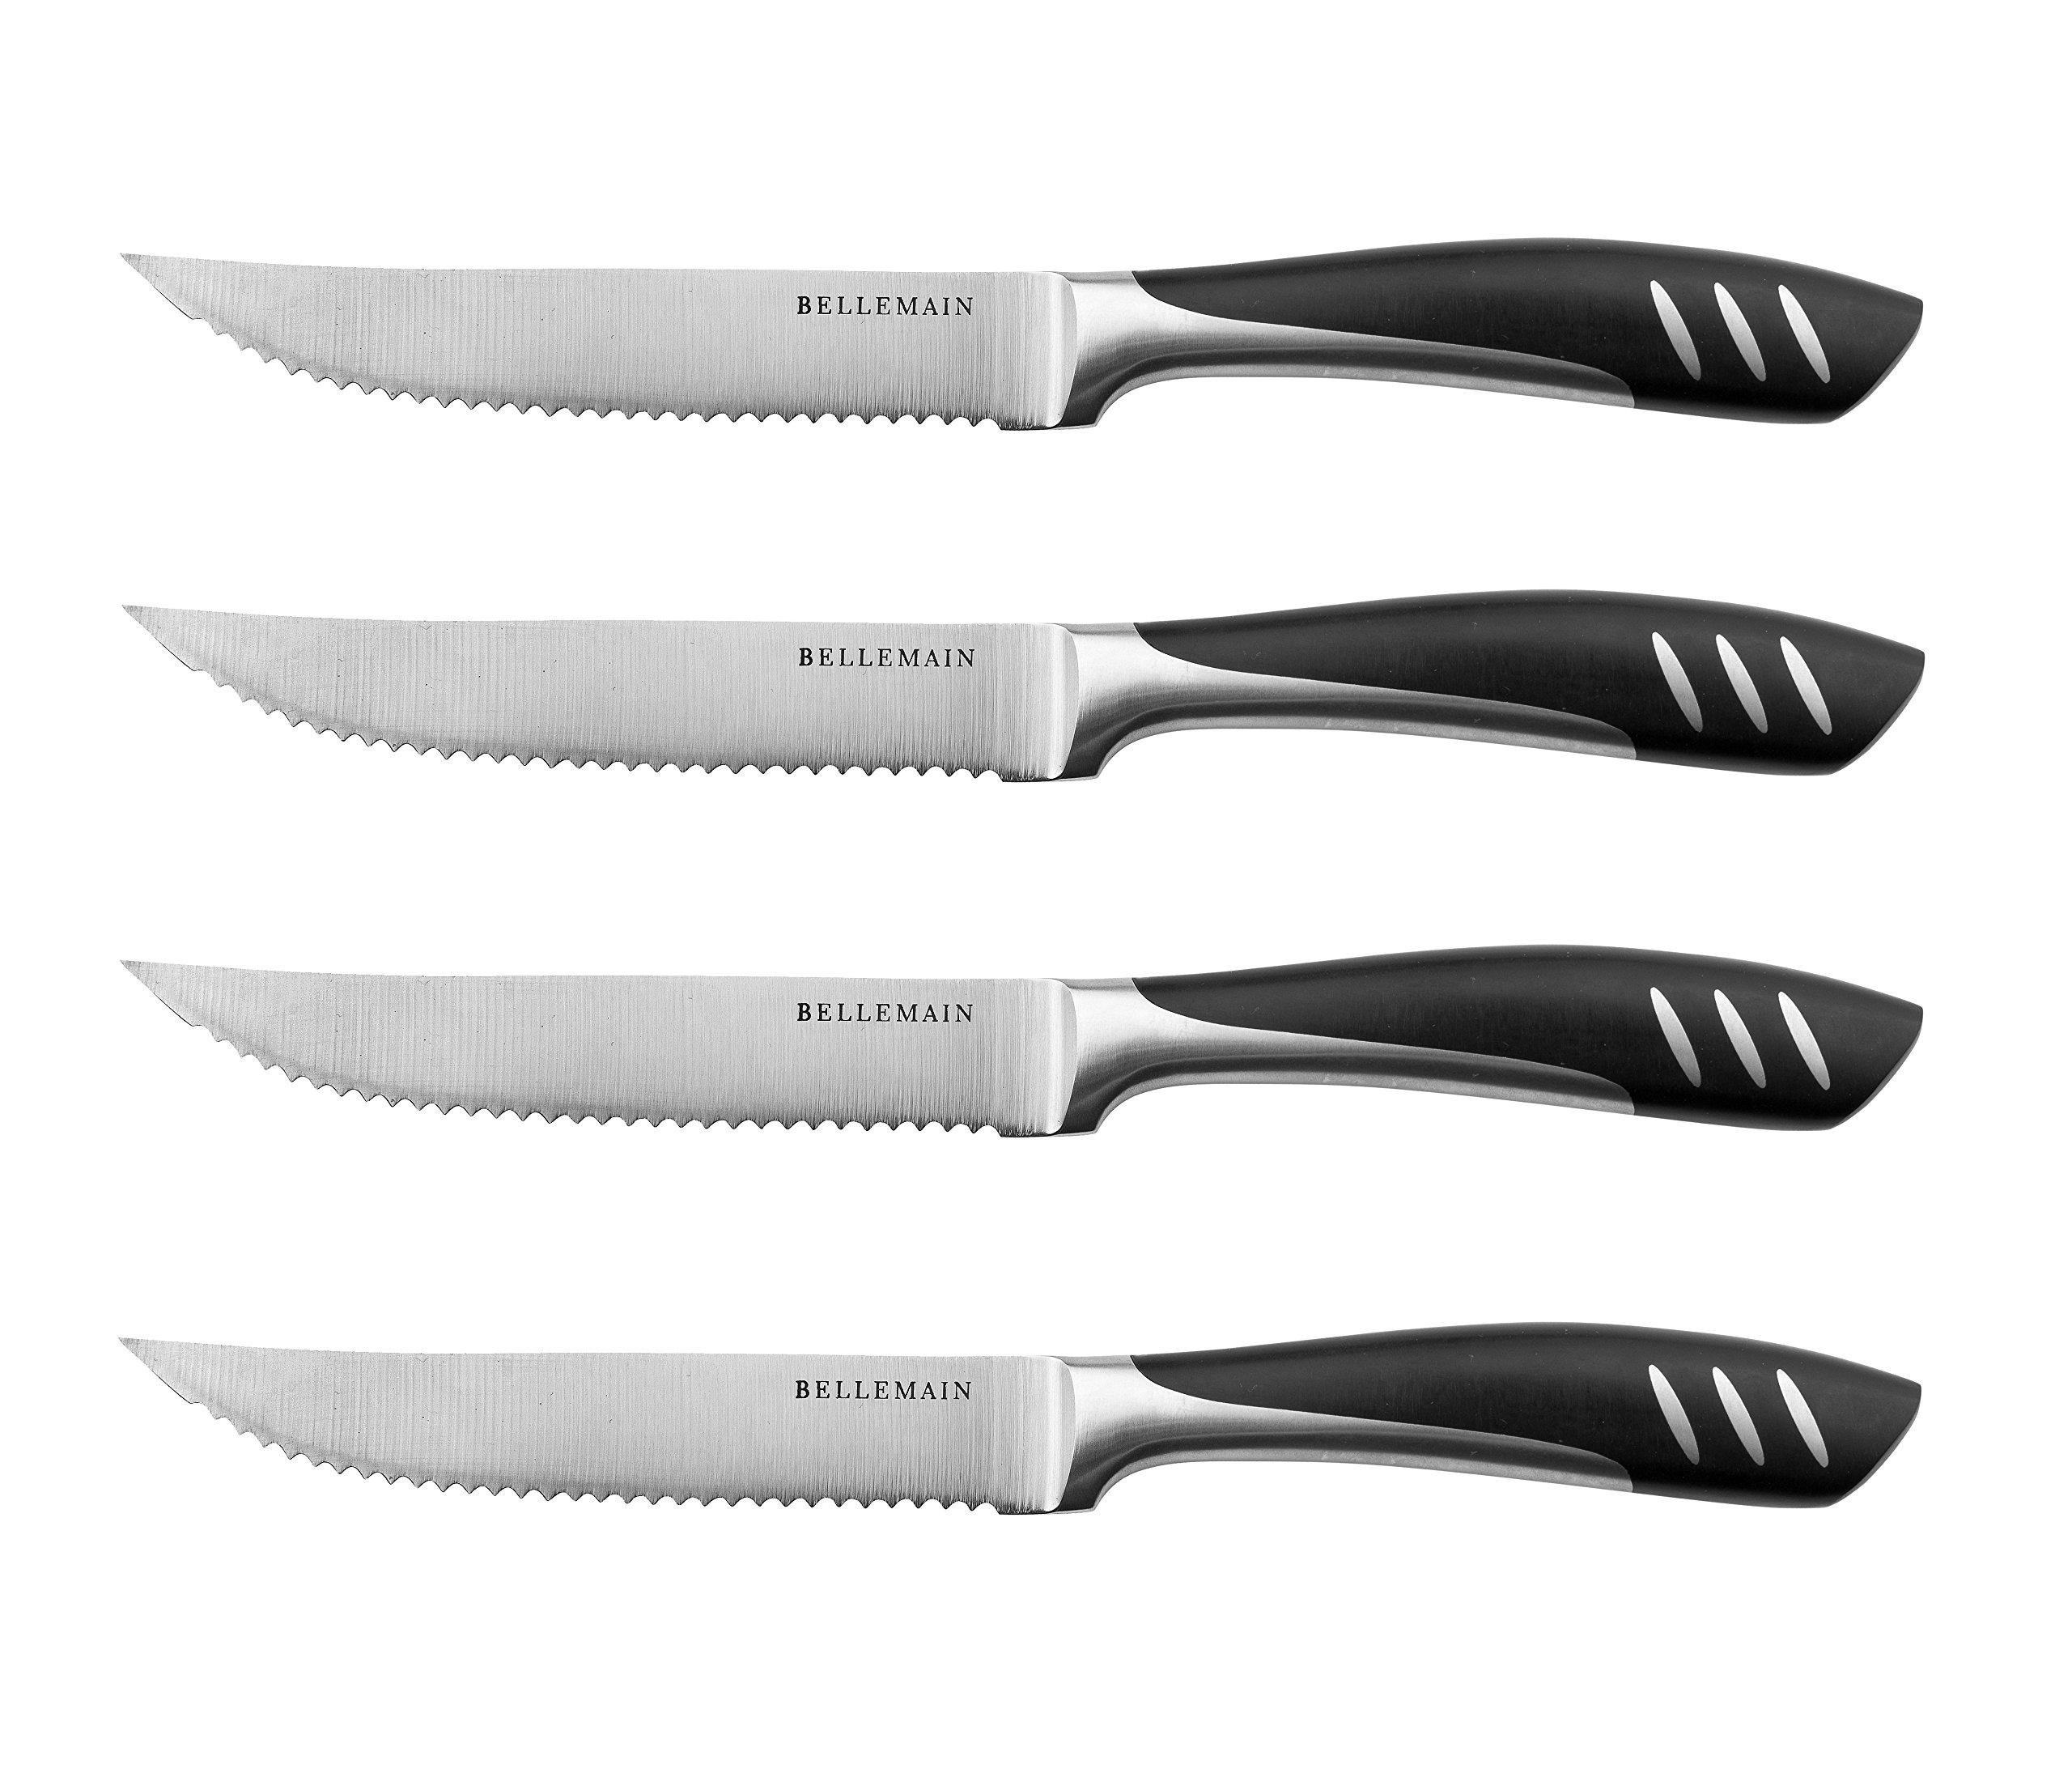 Bellemain Premium Steak Knife Set of 4 Stainless Steel by Bellemain